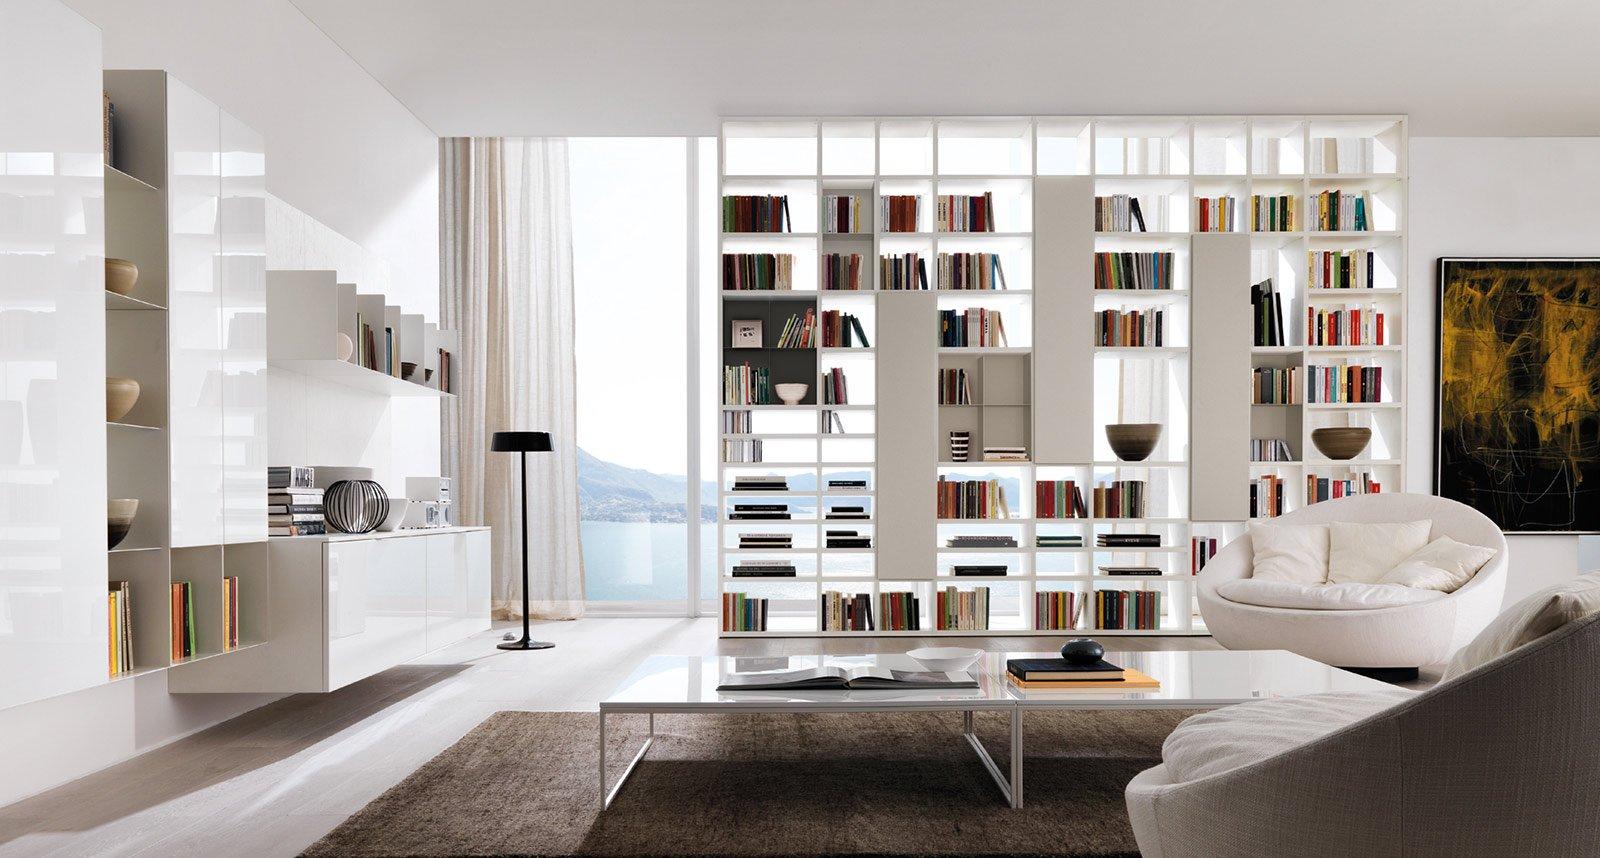 Super Librerie bifacciali per separare ambienti - Cose di Casa QW43